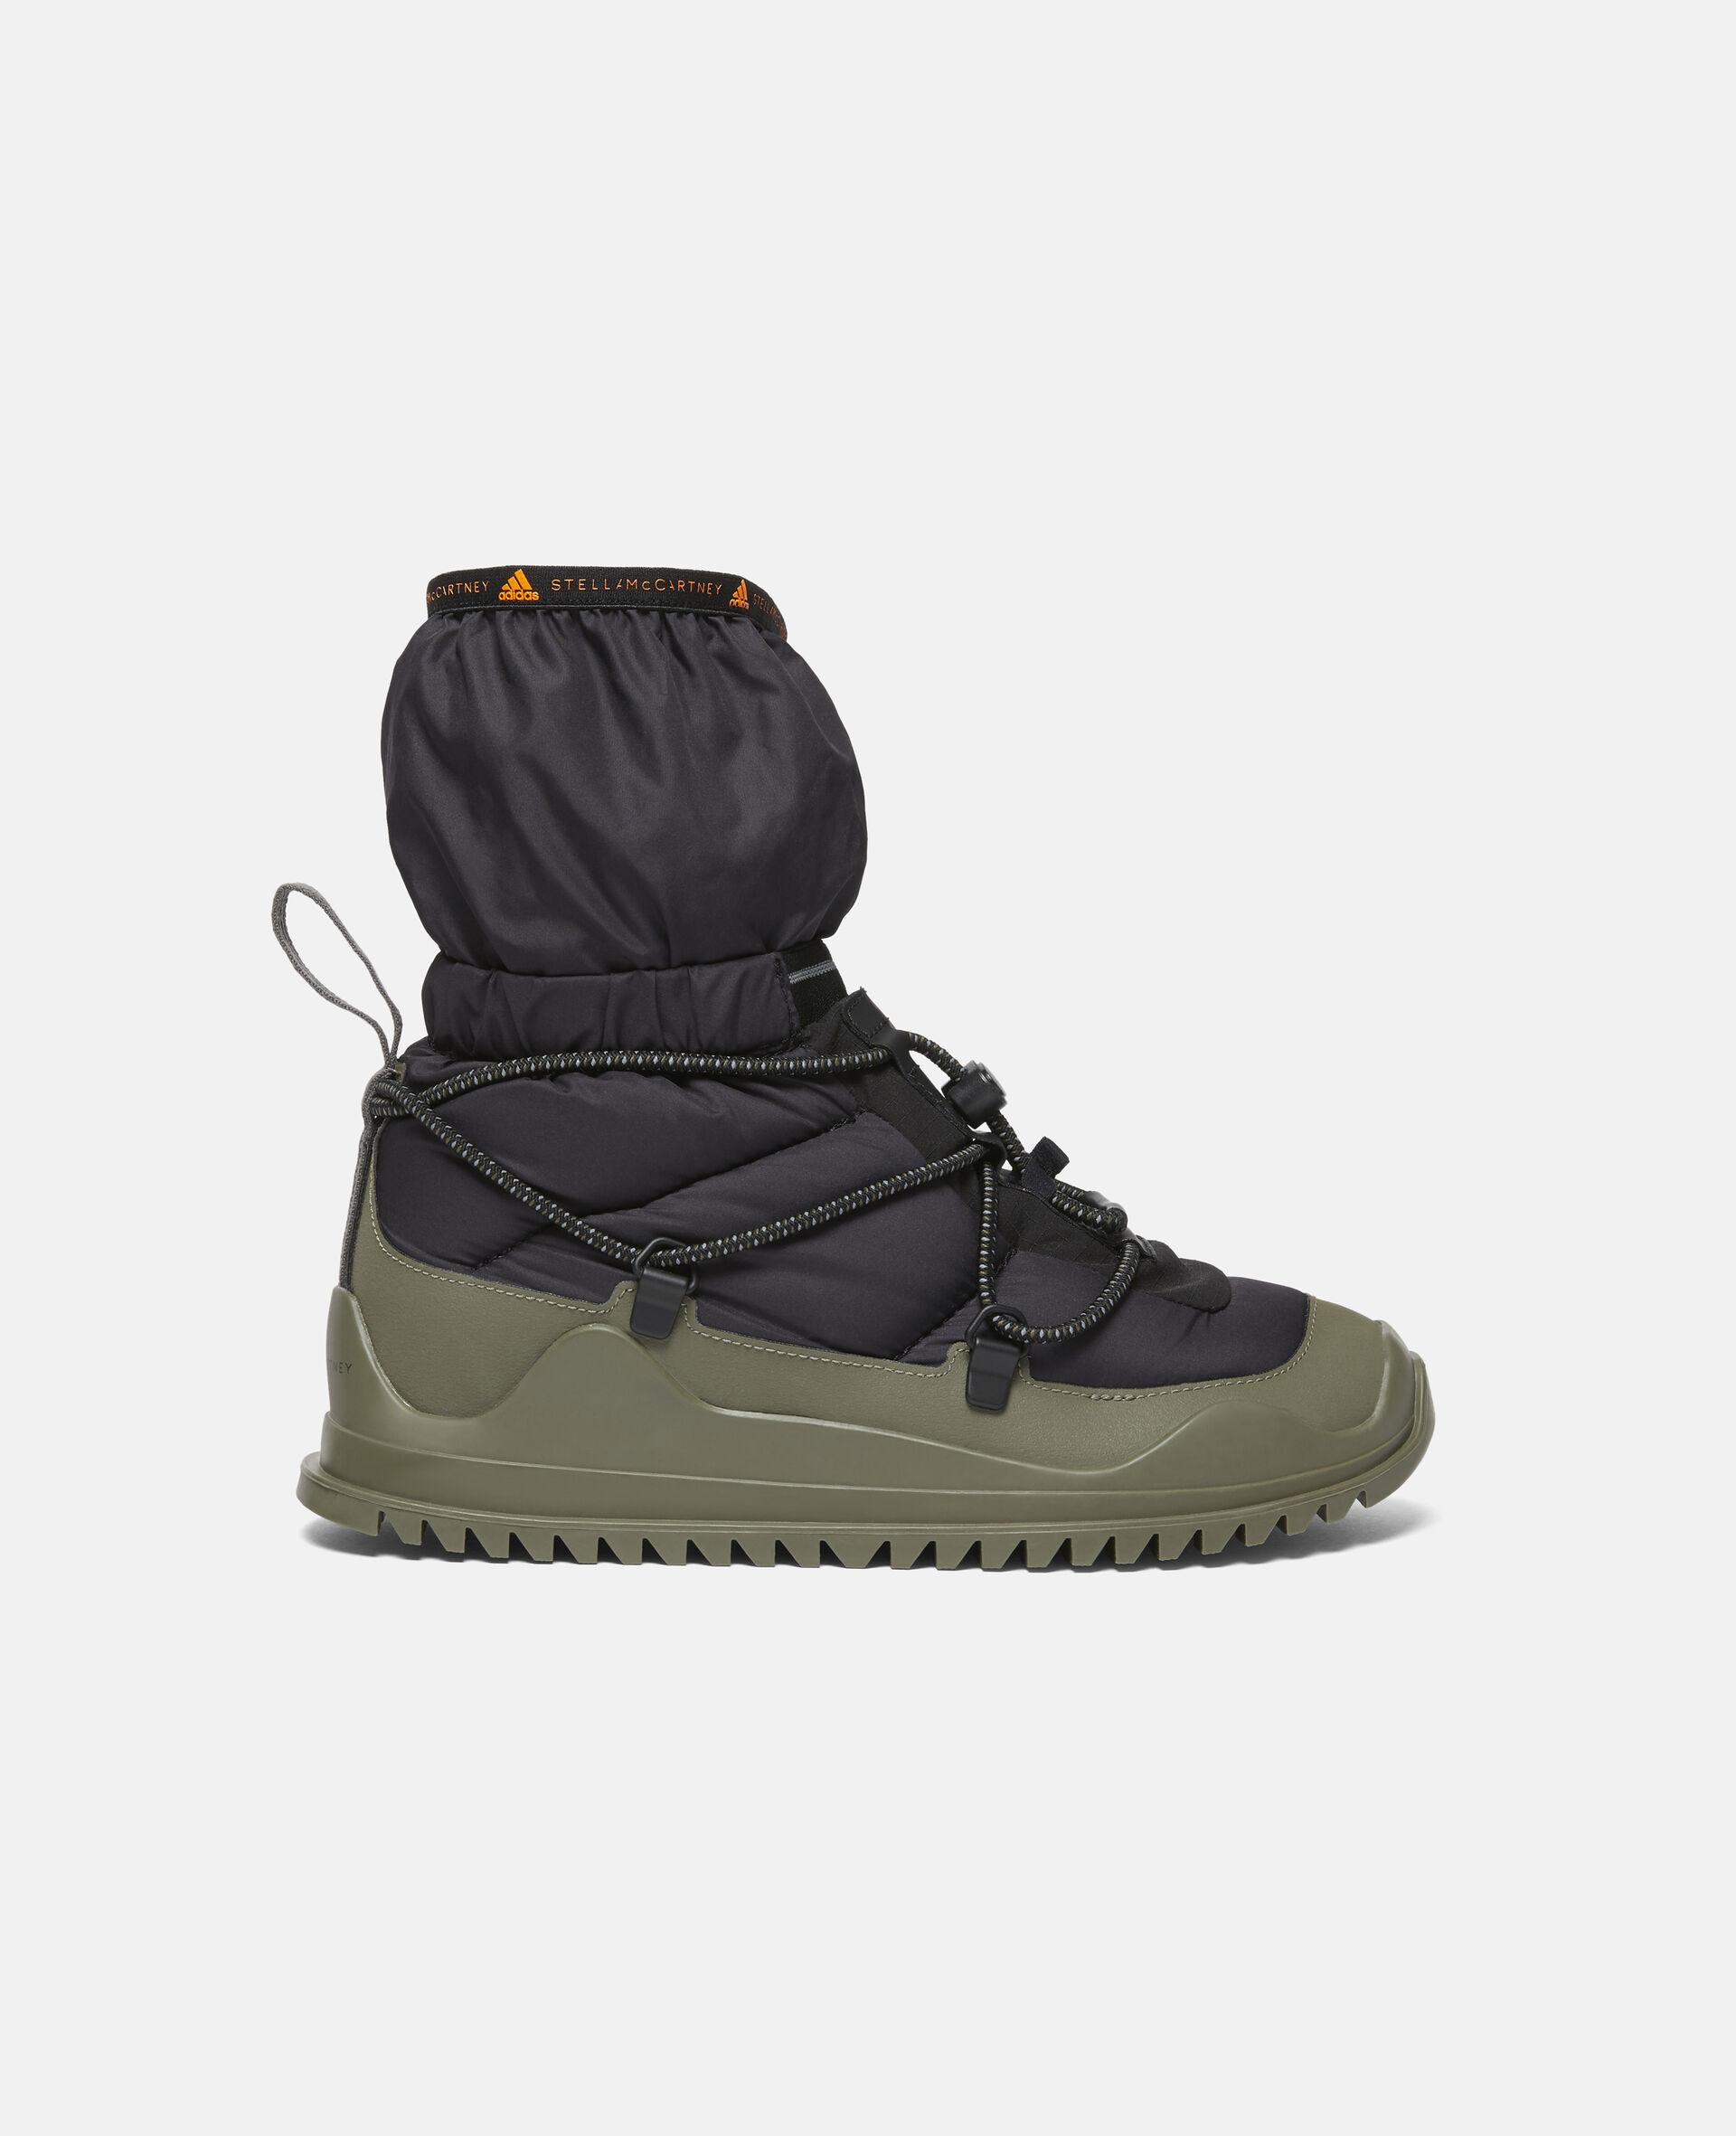 Winter Boots-Black-large image number 2